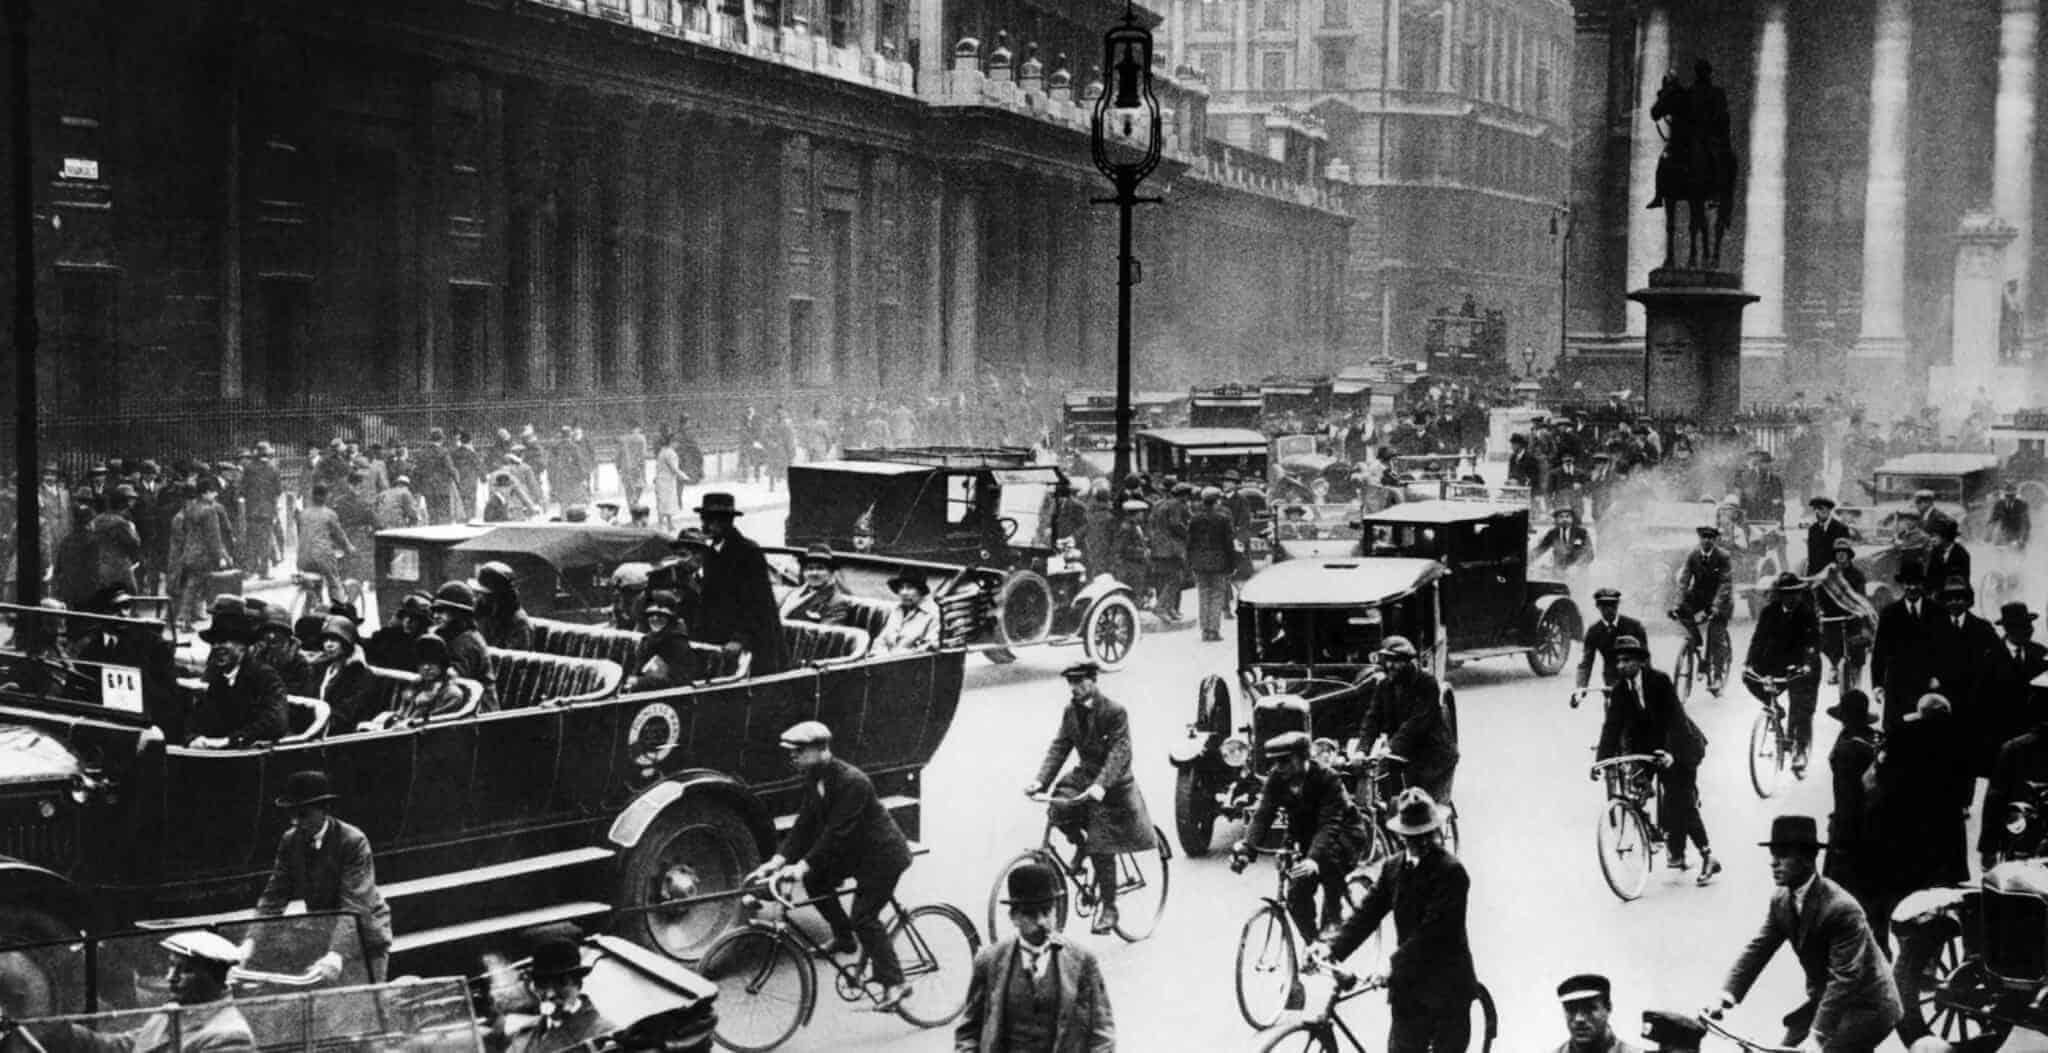 The S The Roaring Twenties In Britain